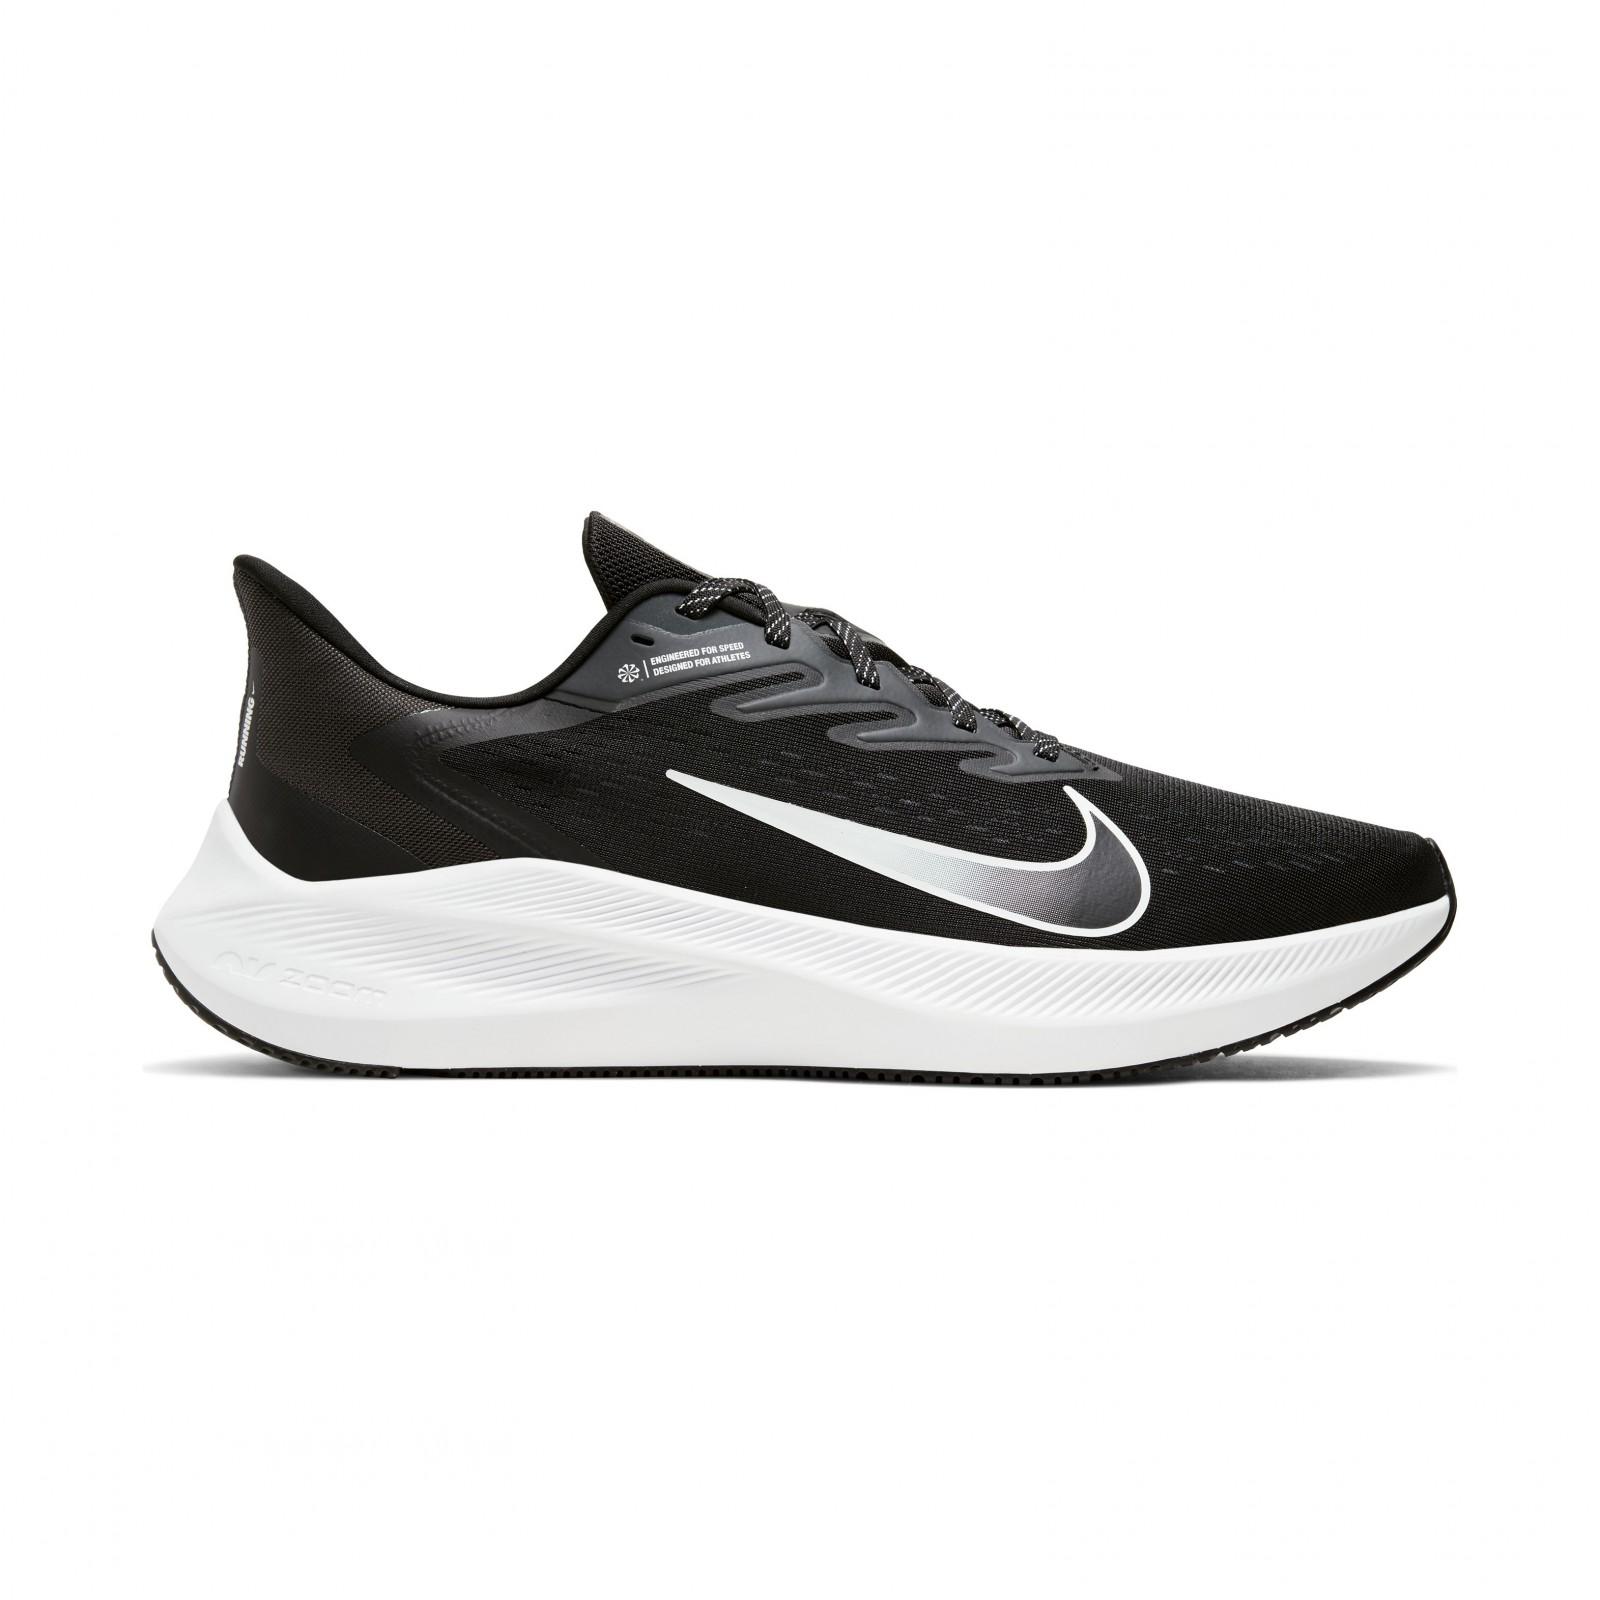 Nike Air Zoom Winflo 7 BLACK/WHITE-ANTHRACITE